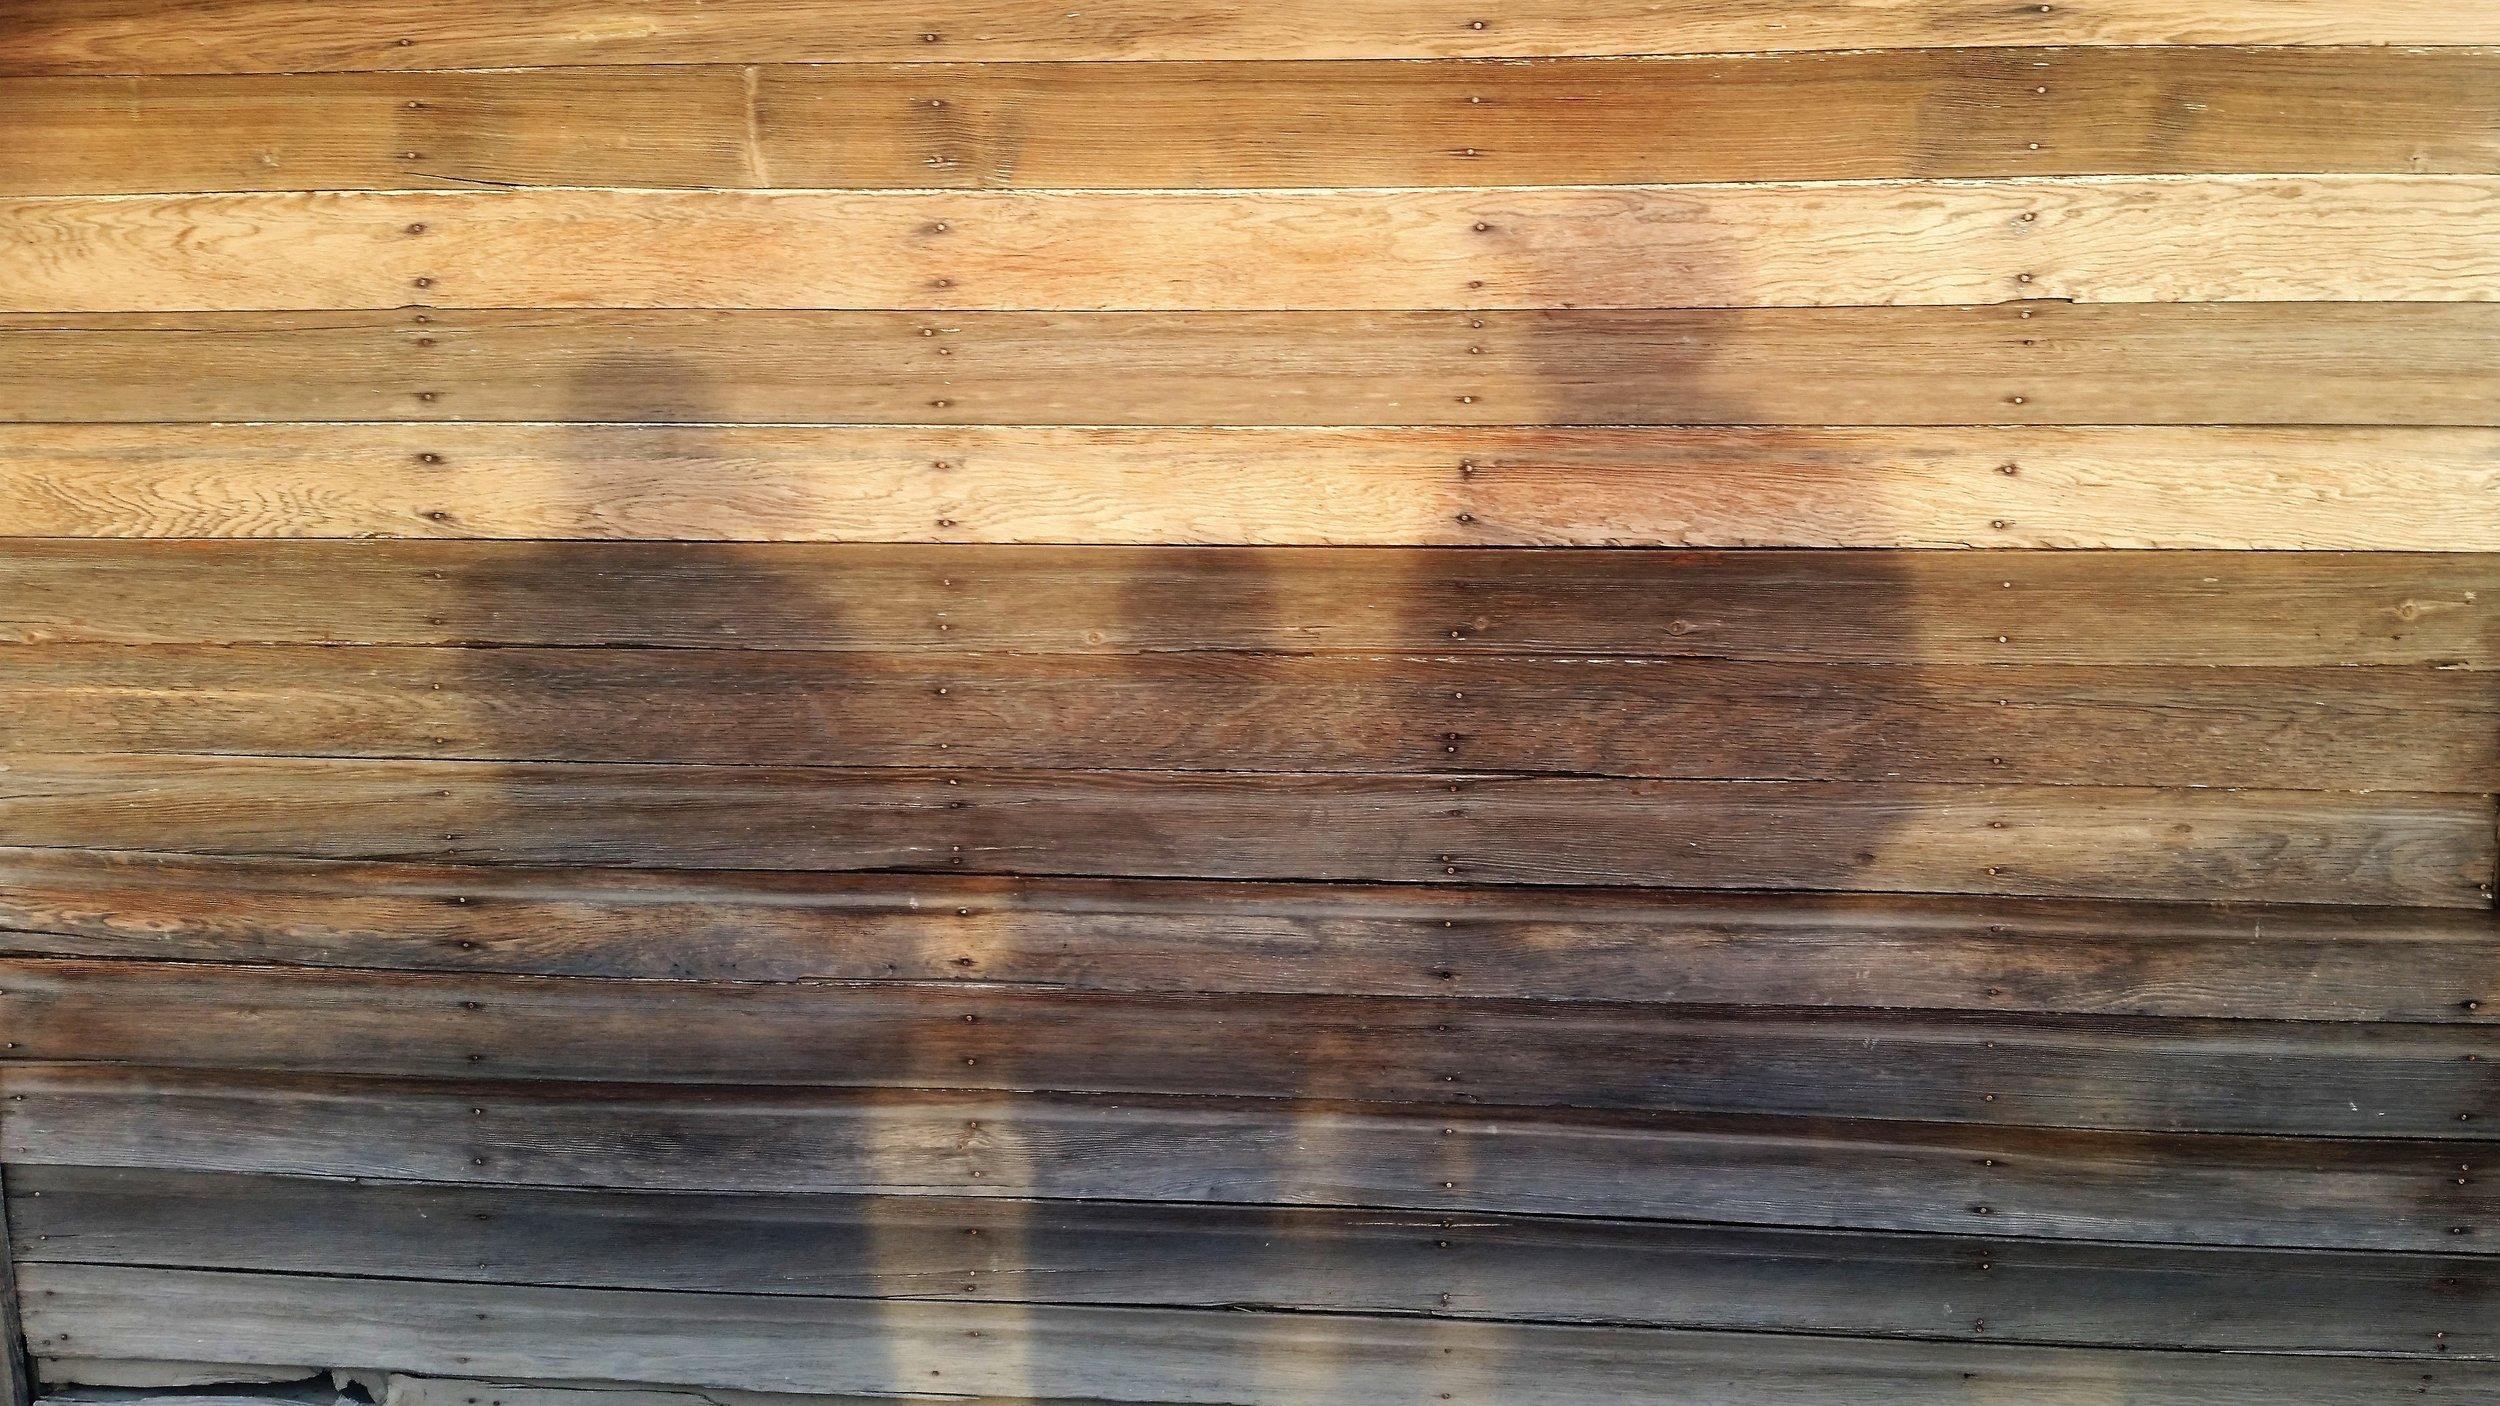 shadows1_enhanced.jpg